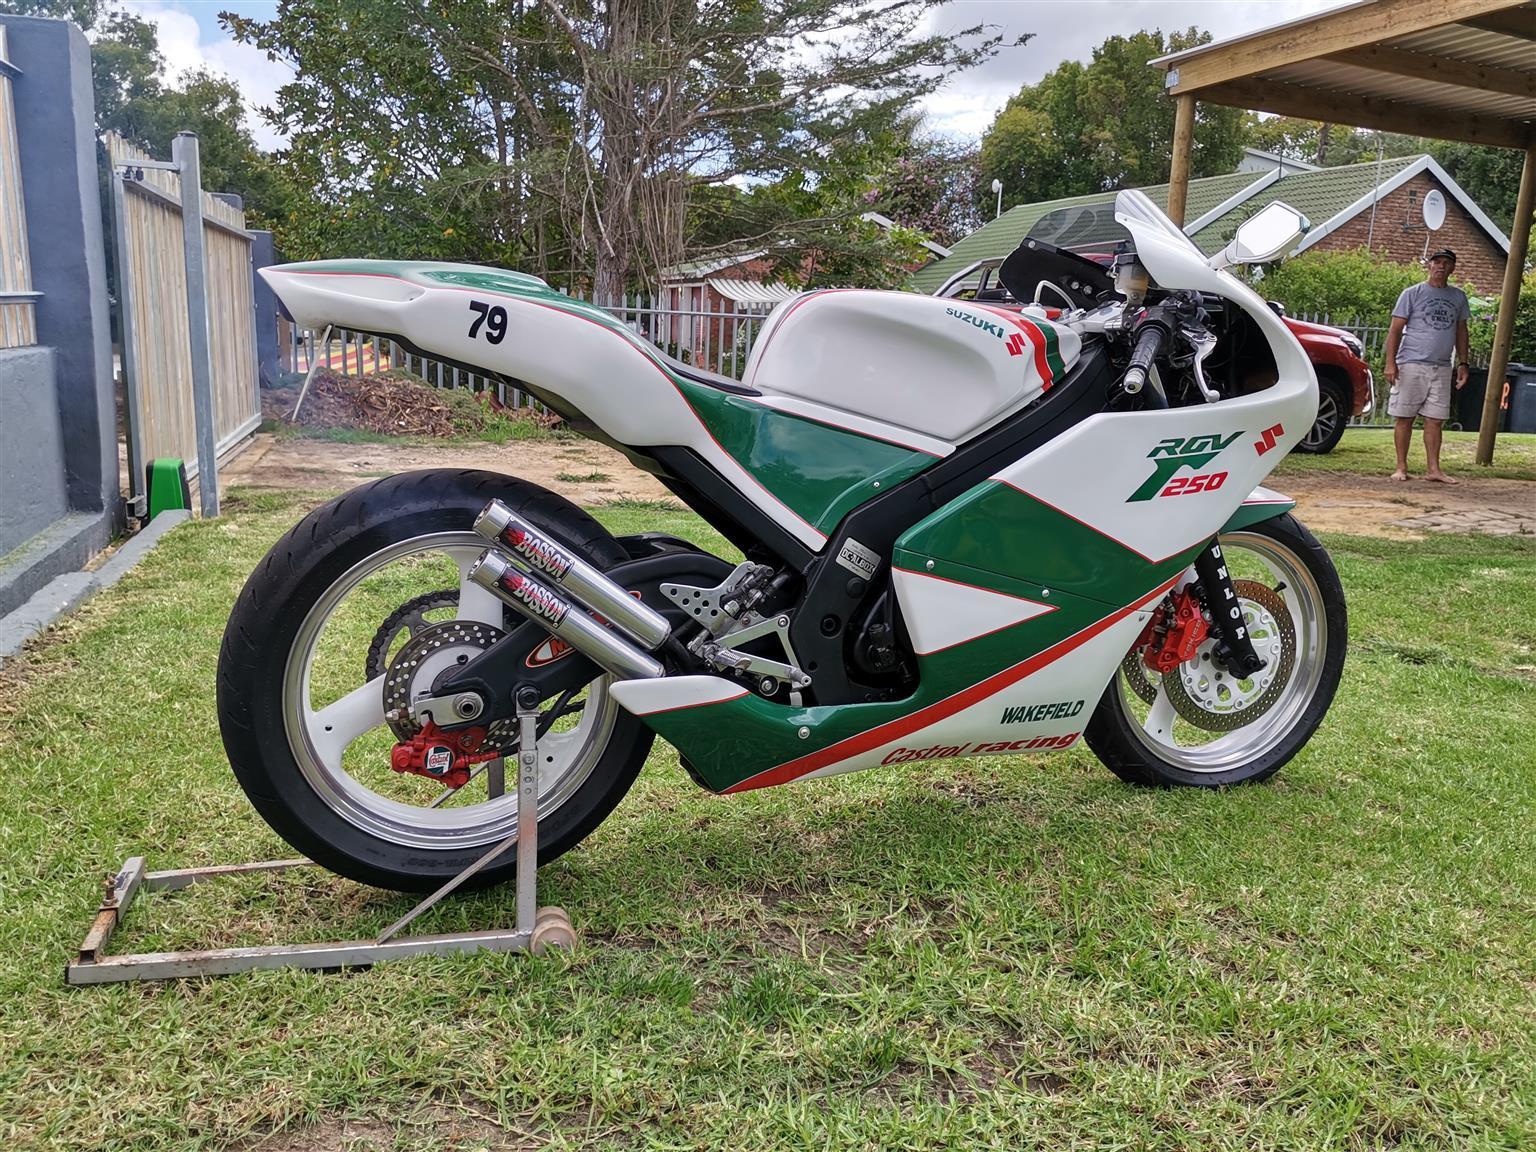 Suzuki Rgv 250 fully custom, Papers in order